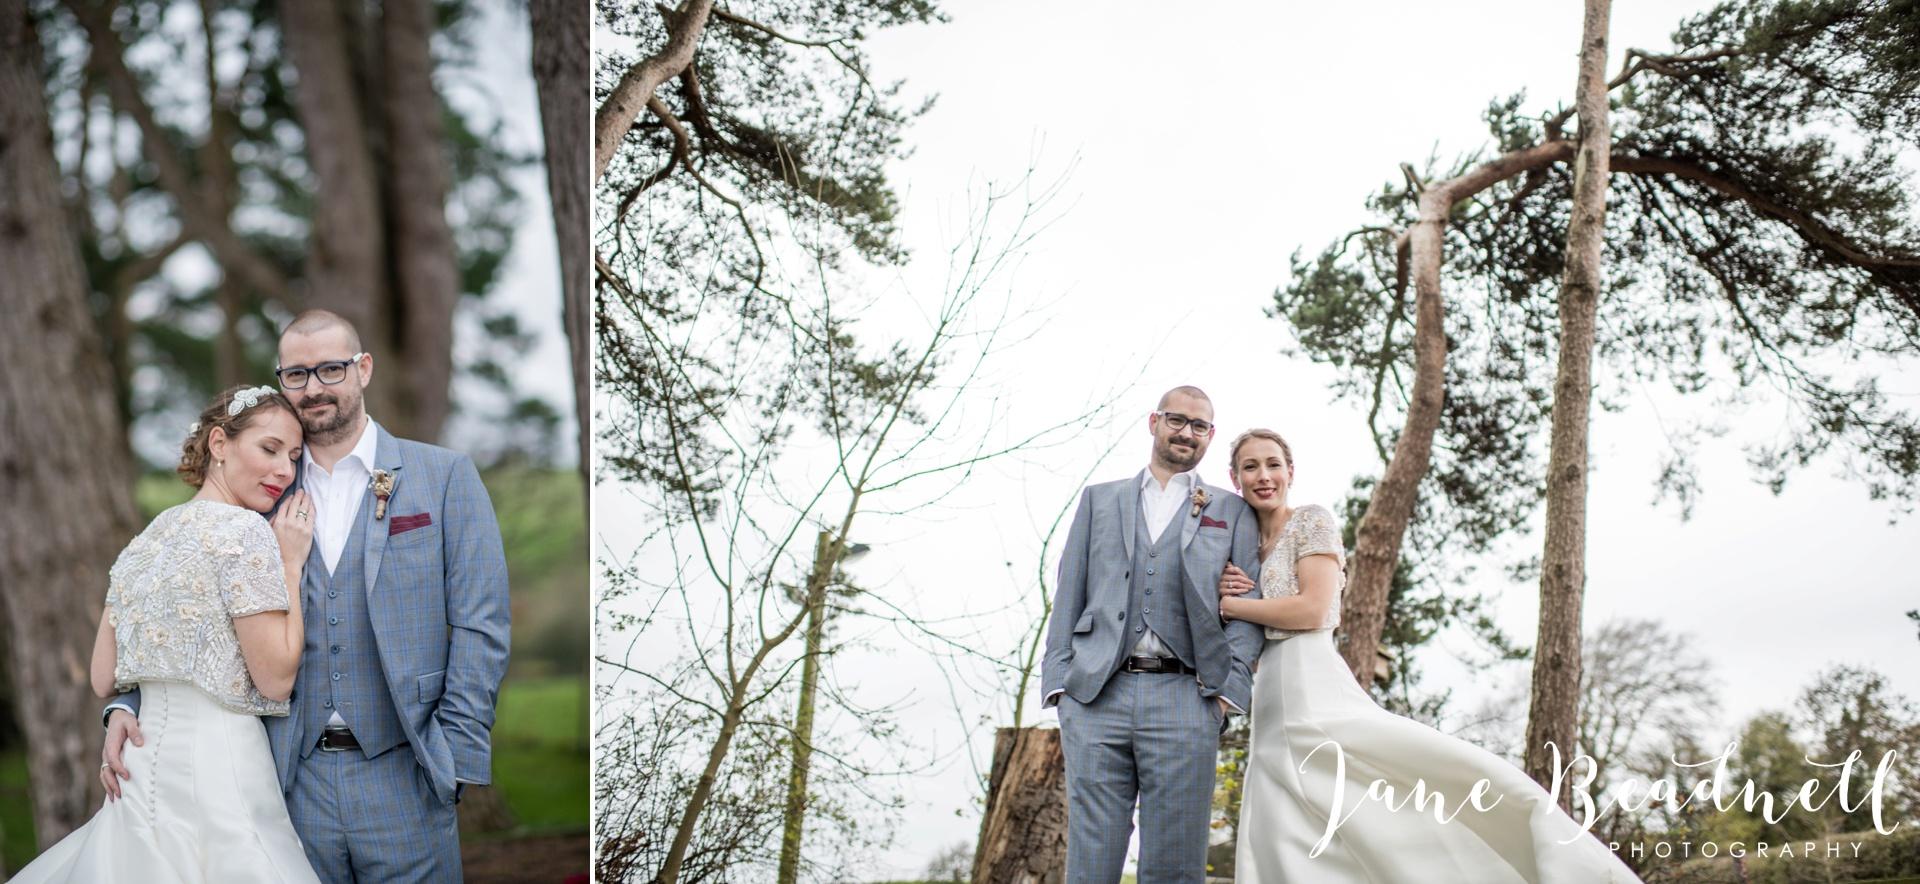 The Kingcote Barn Bristol Yorkshire and destination wedding photographer Jane Beadnell Photography_0066